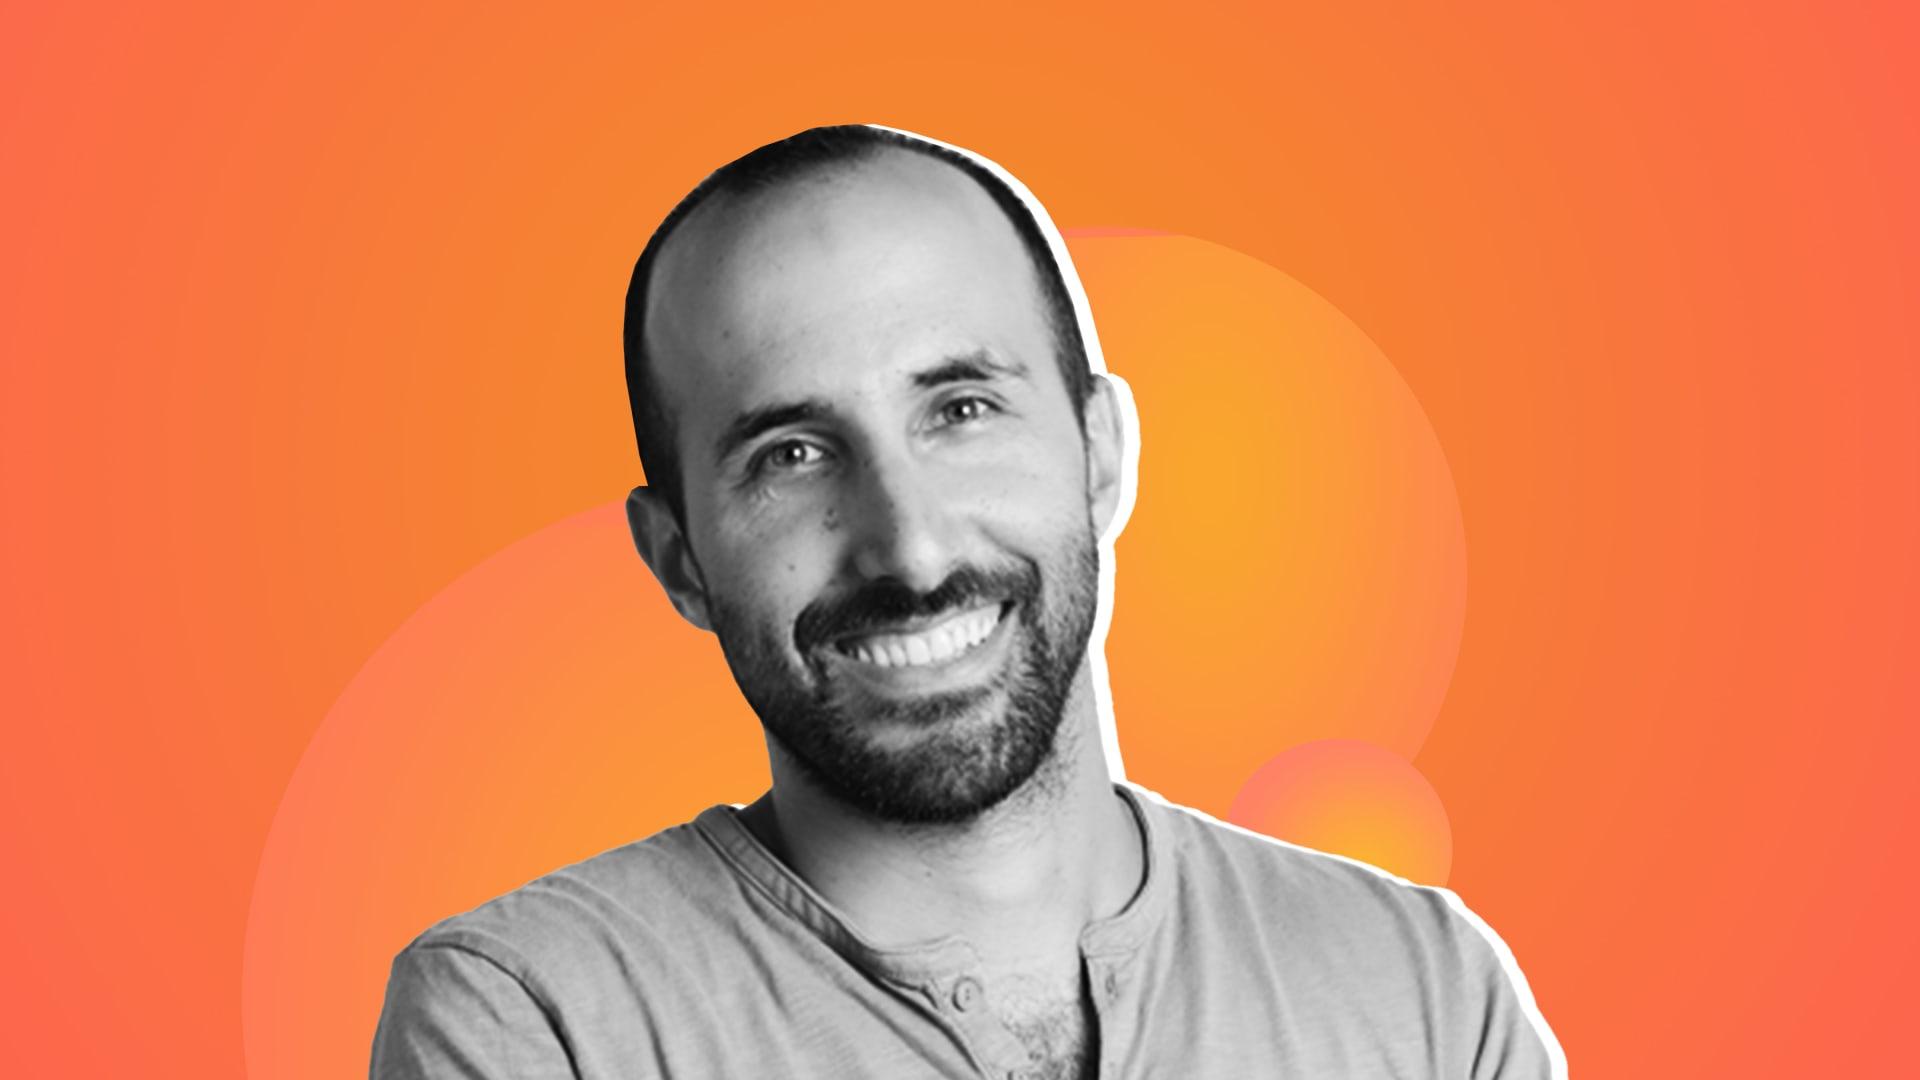 Yoni Tserruya, co-founder and CEO of Lusha.